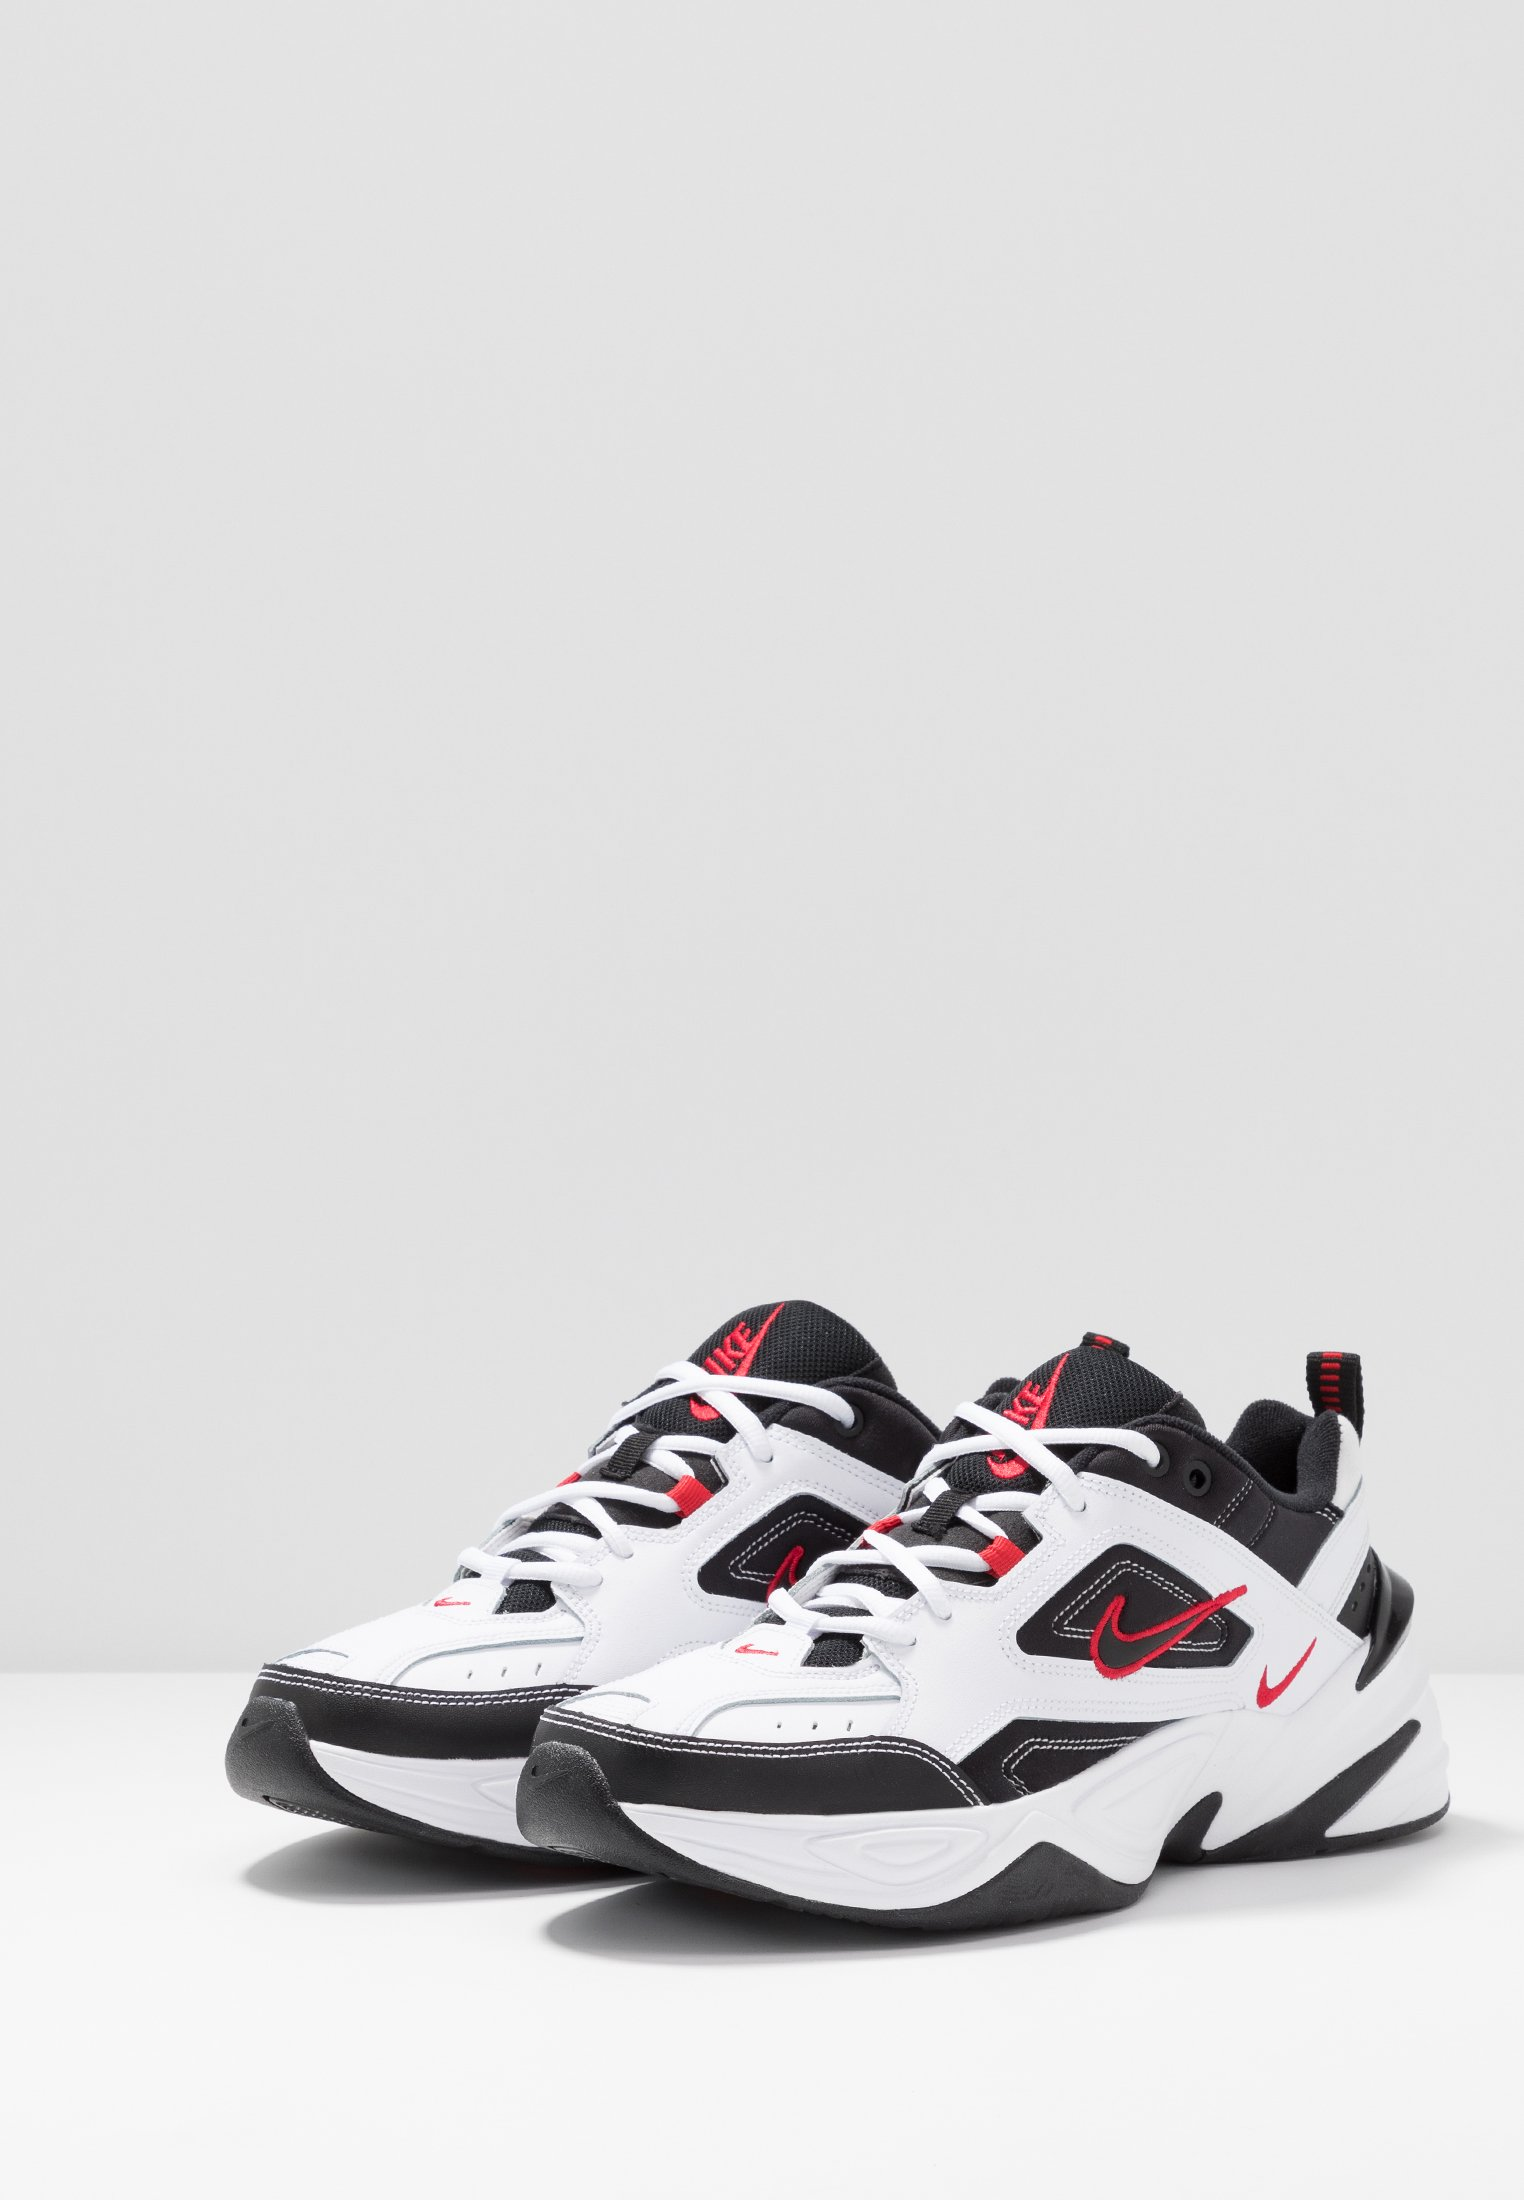 White university black Red Nike Basses Sportswear TeknoBaskets M2k 4L5Aj3R